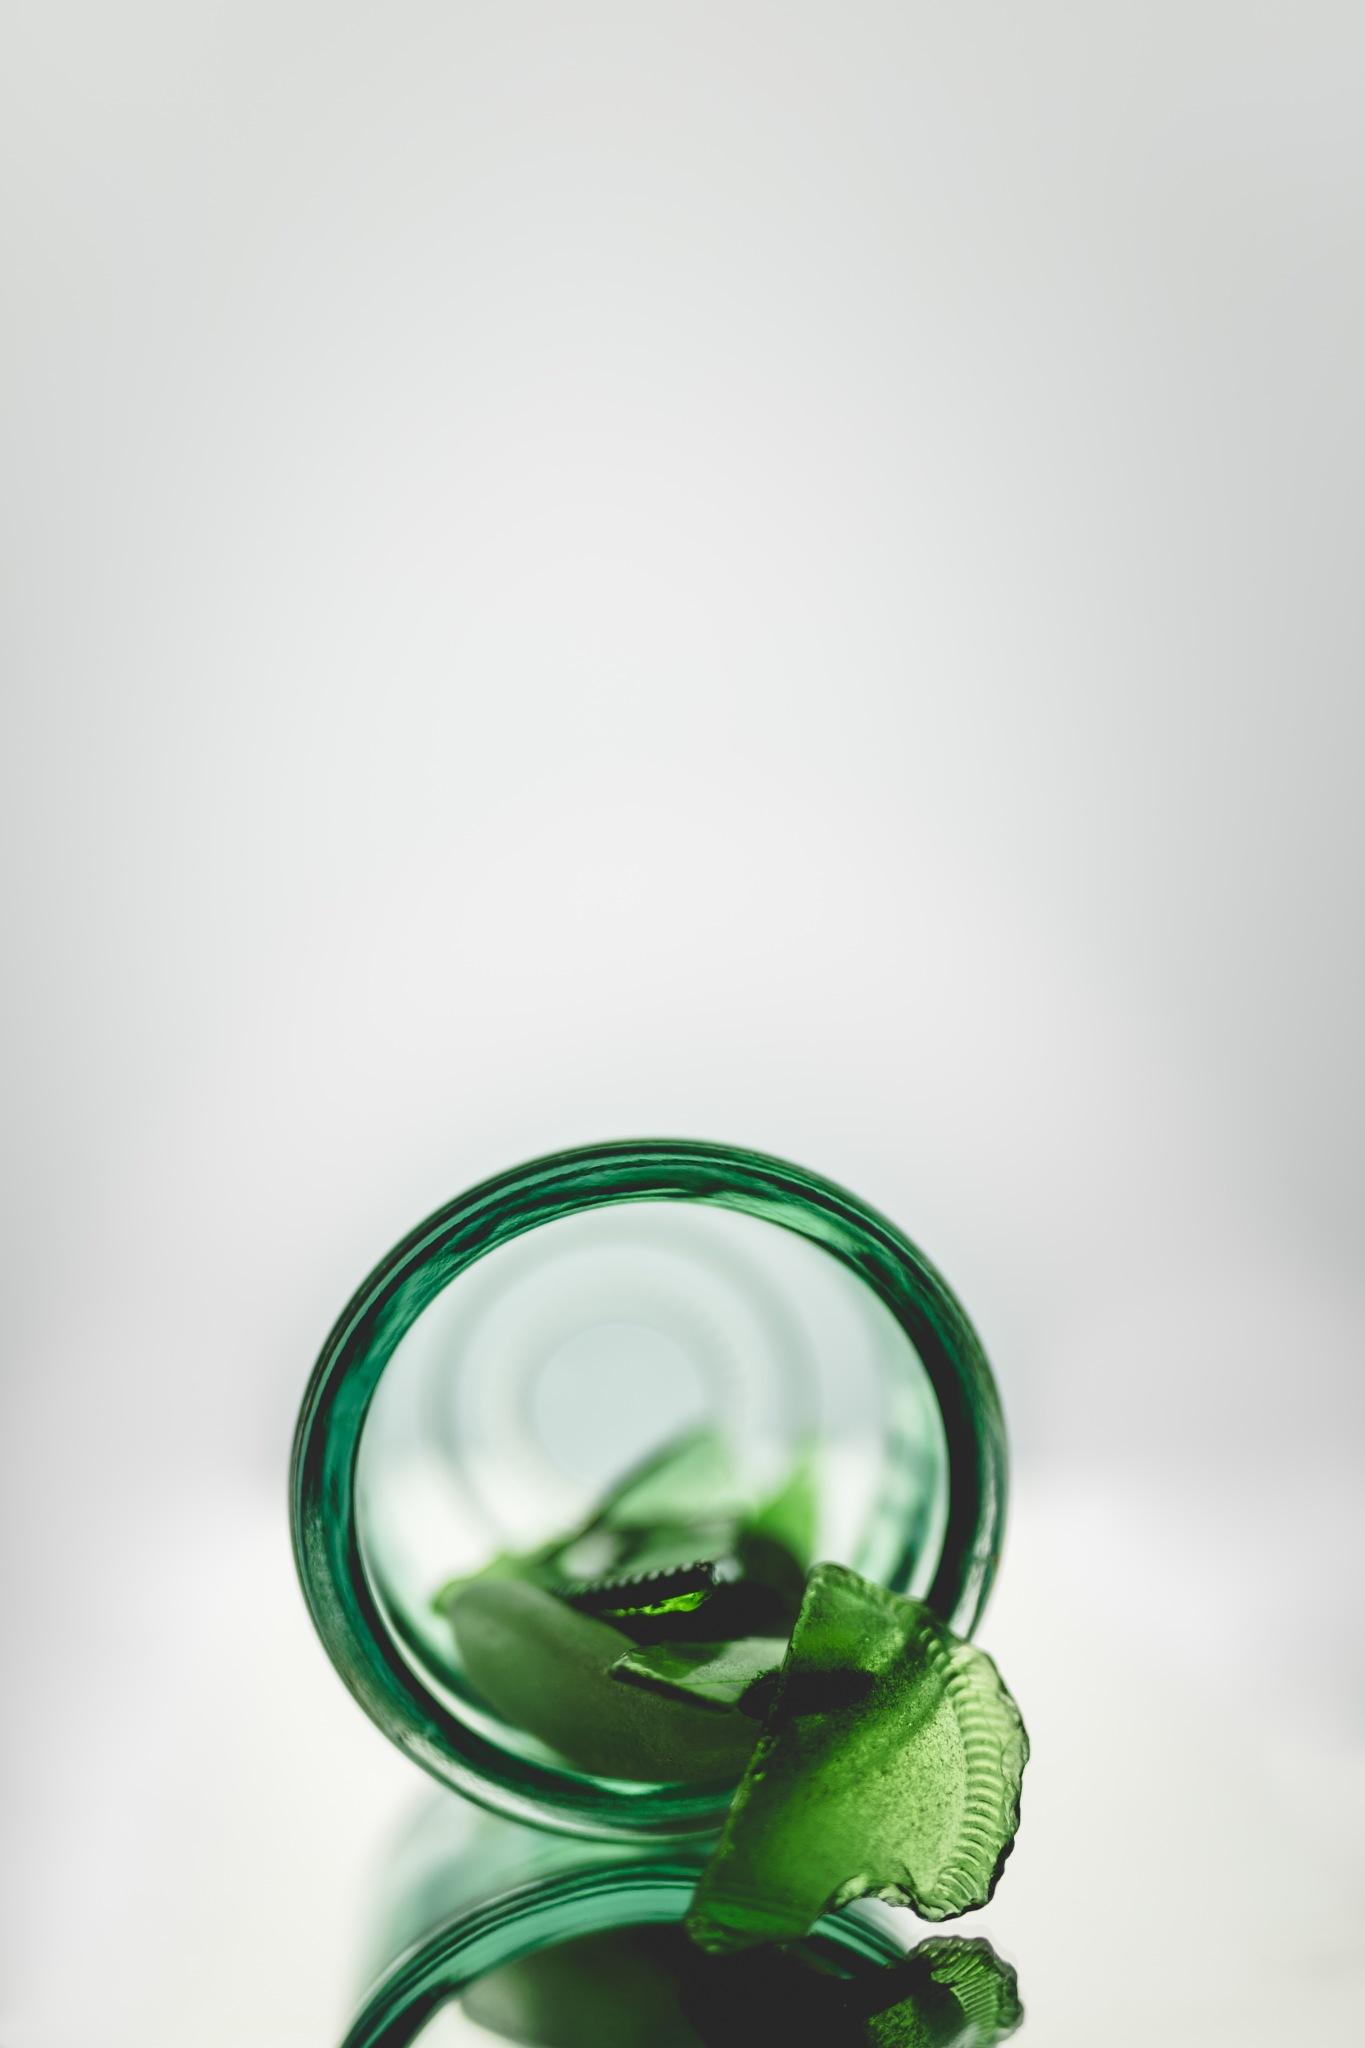 #076/365 Green by Debra Lincoln- MacPherson